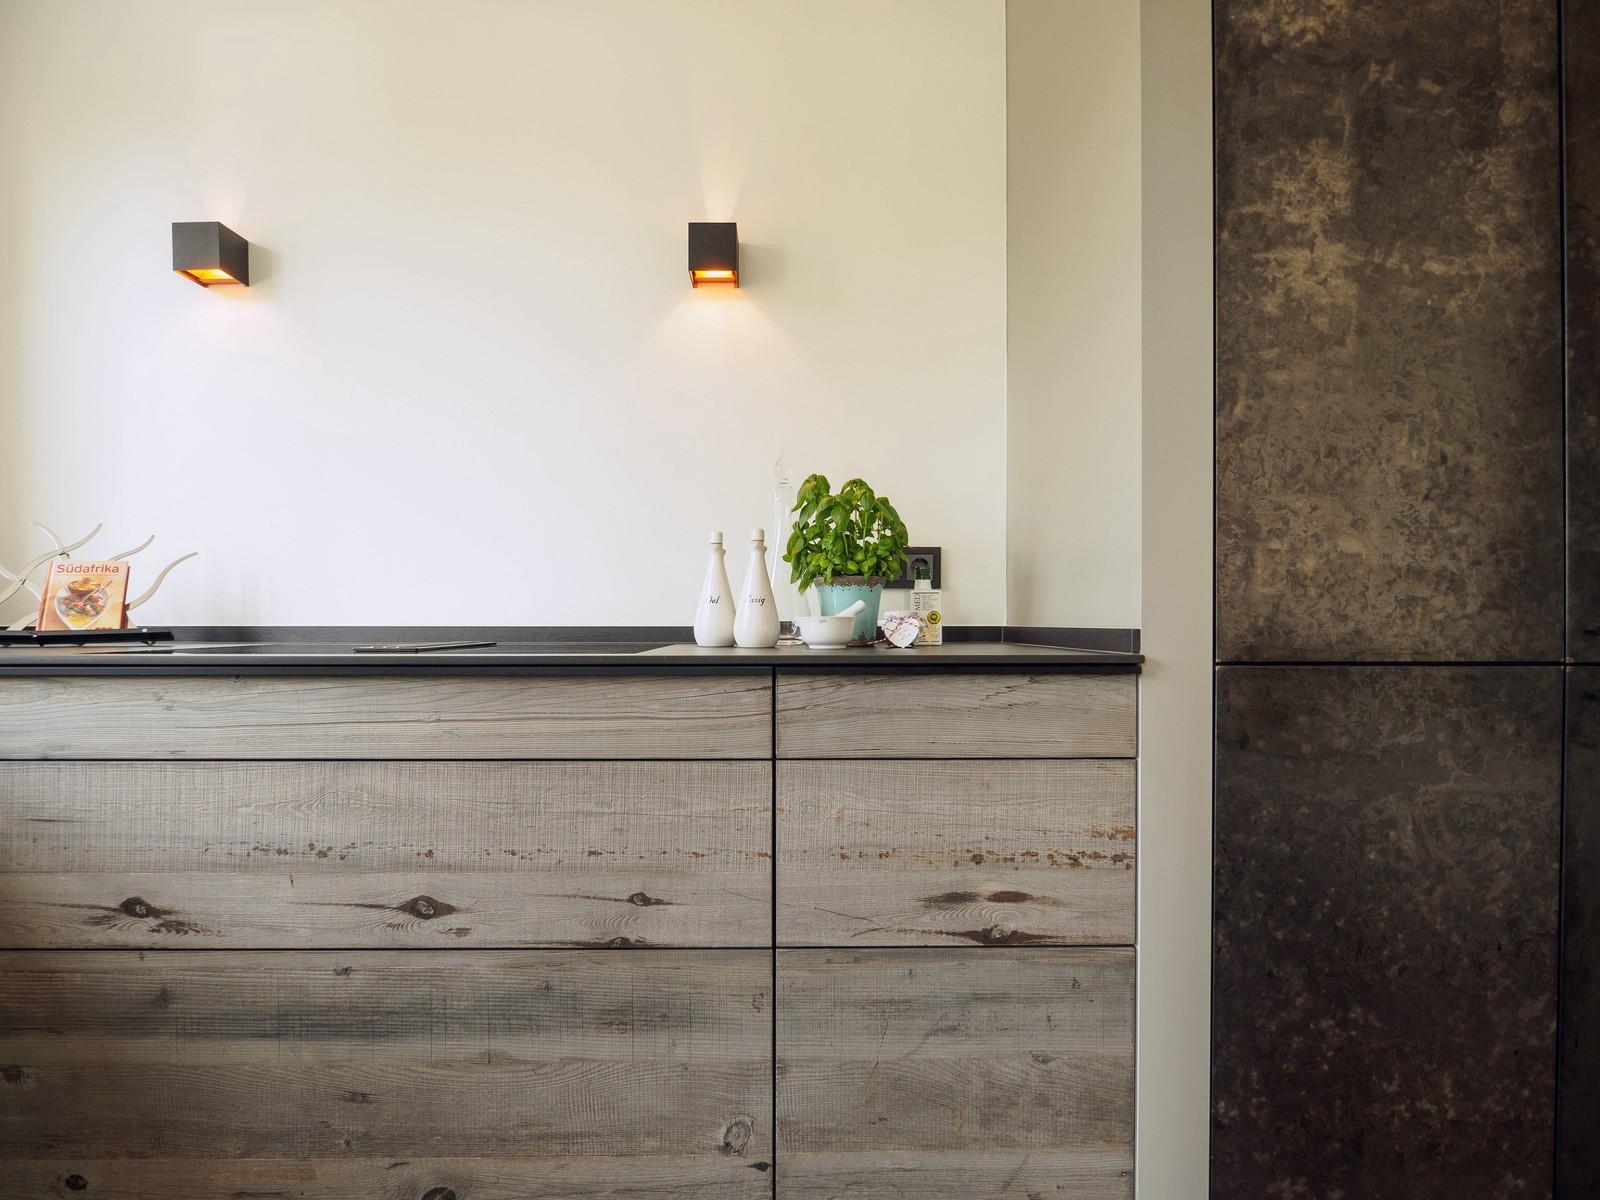 Kueche Exklusiv Design Fronten Holz Furnier Sonnenverbrannt Stahl Keramik Arbeitsplatte Miele 62